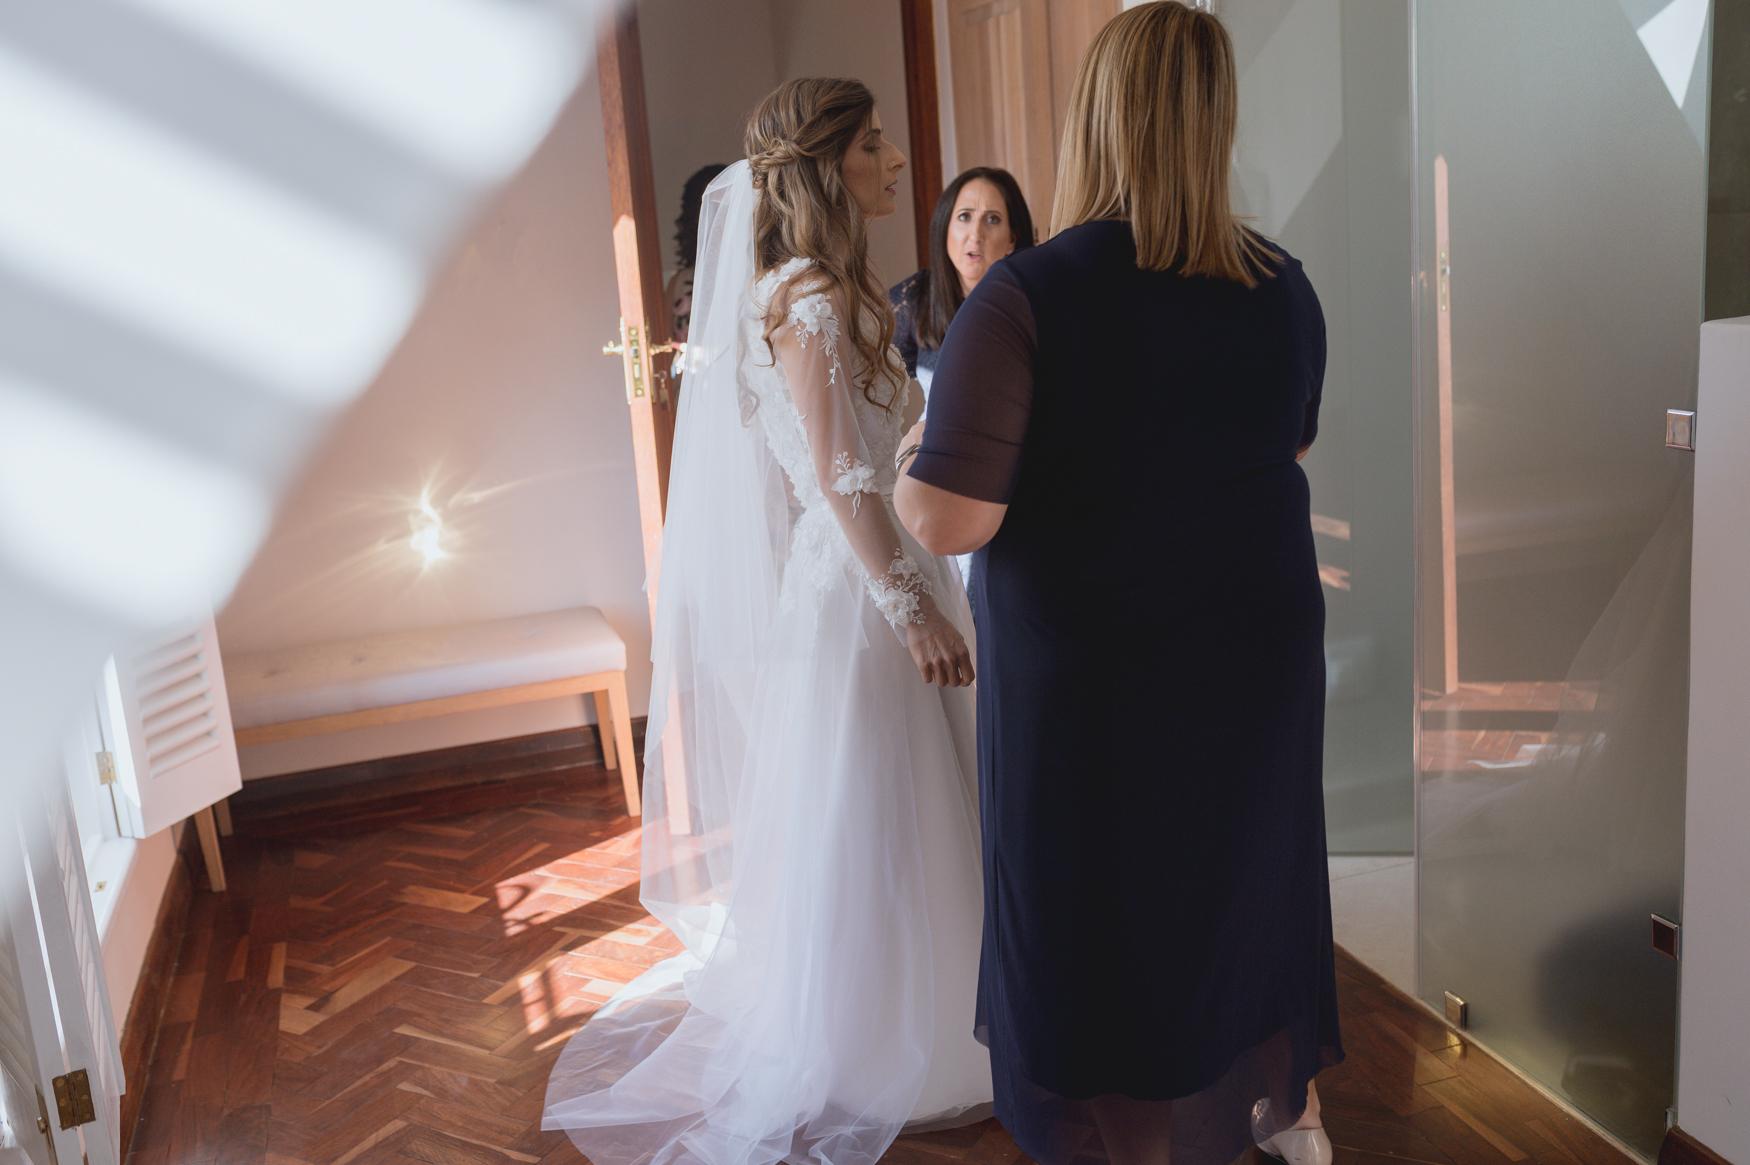 Leon_&_Martine's_Wedding_Photographs_17th_April_2019_@johnhenryweddingphoto_Low_Resolution_Web-169.JPG